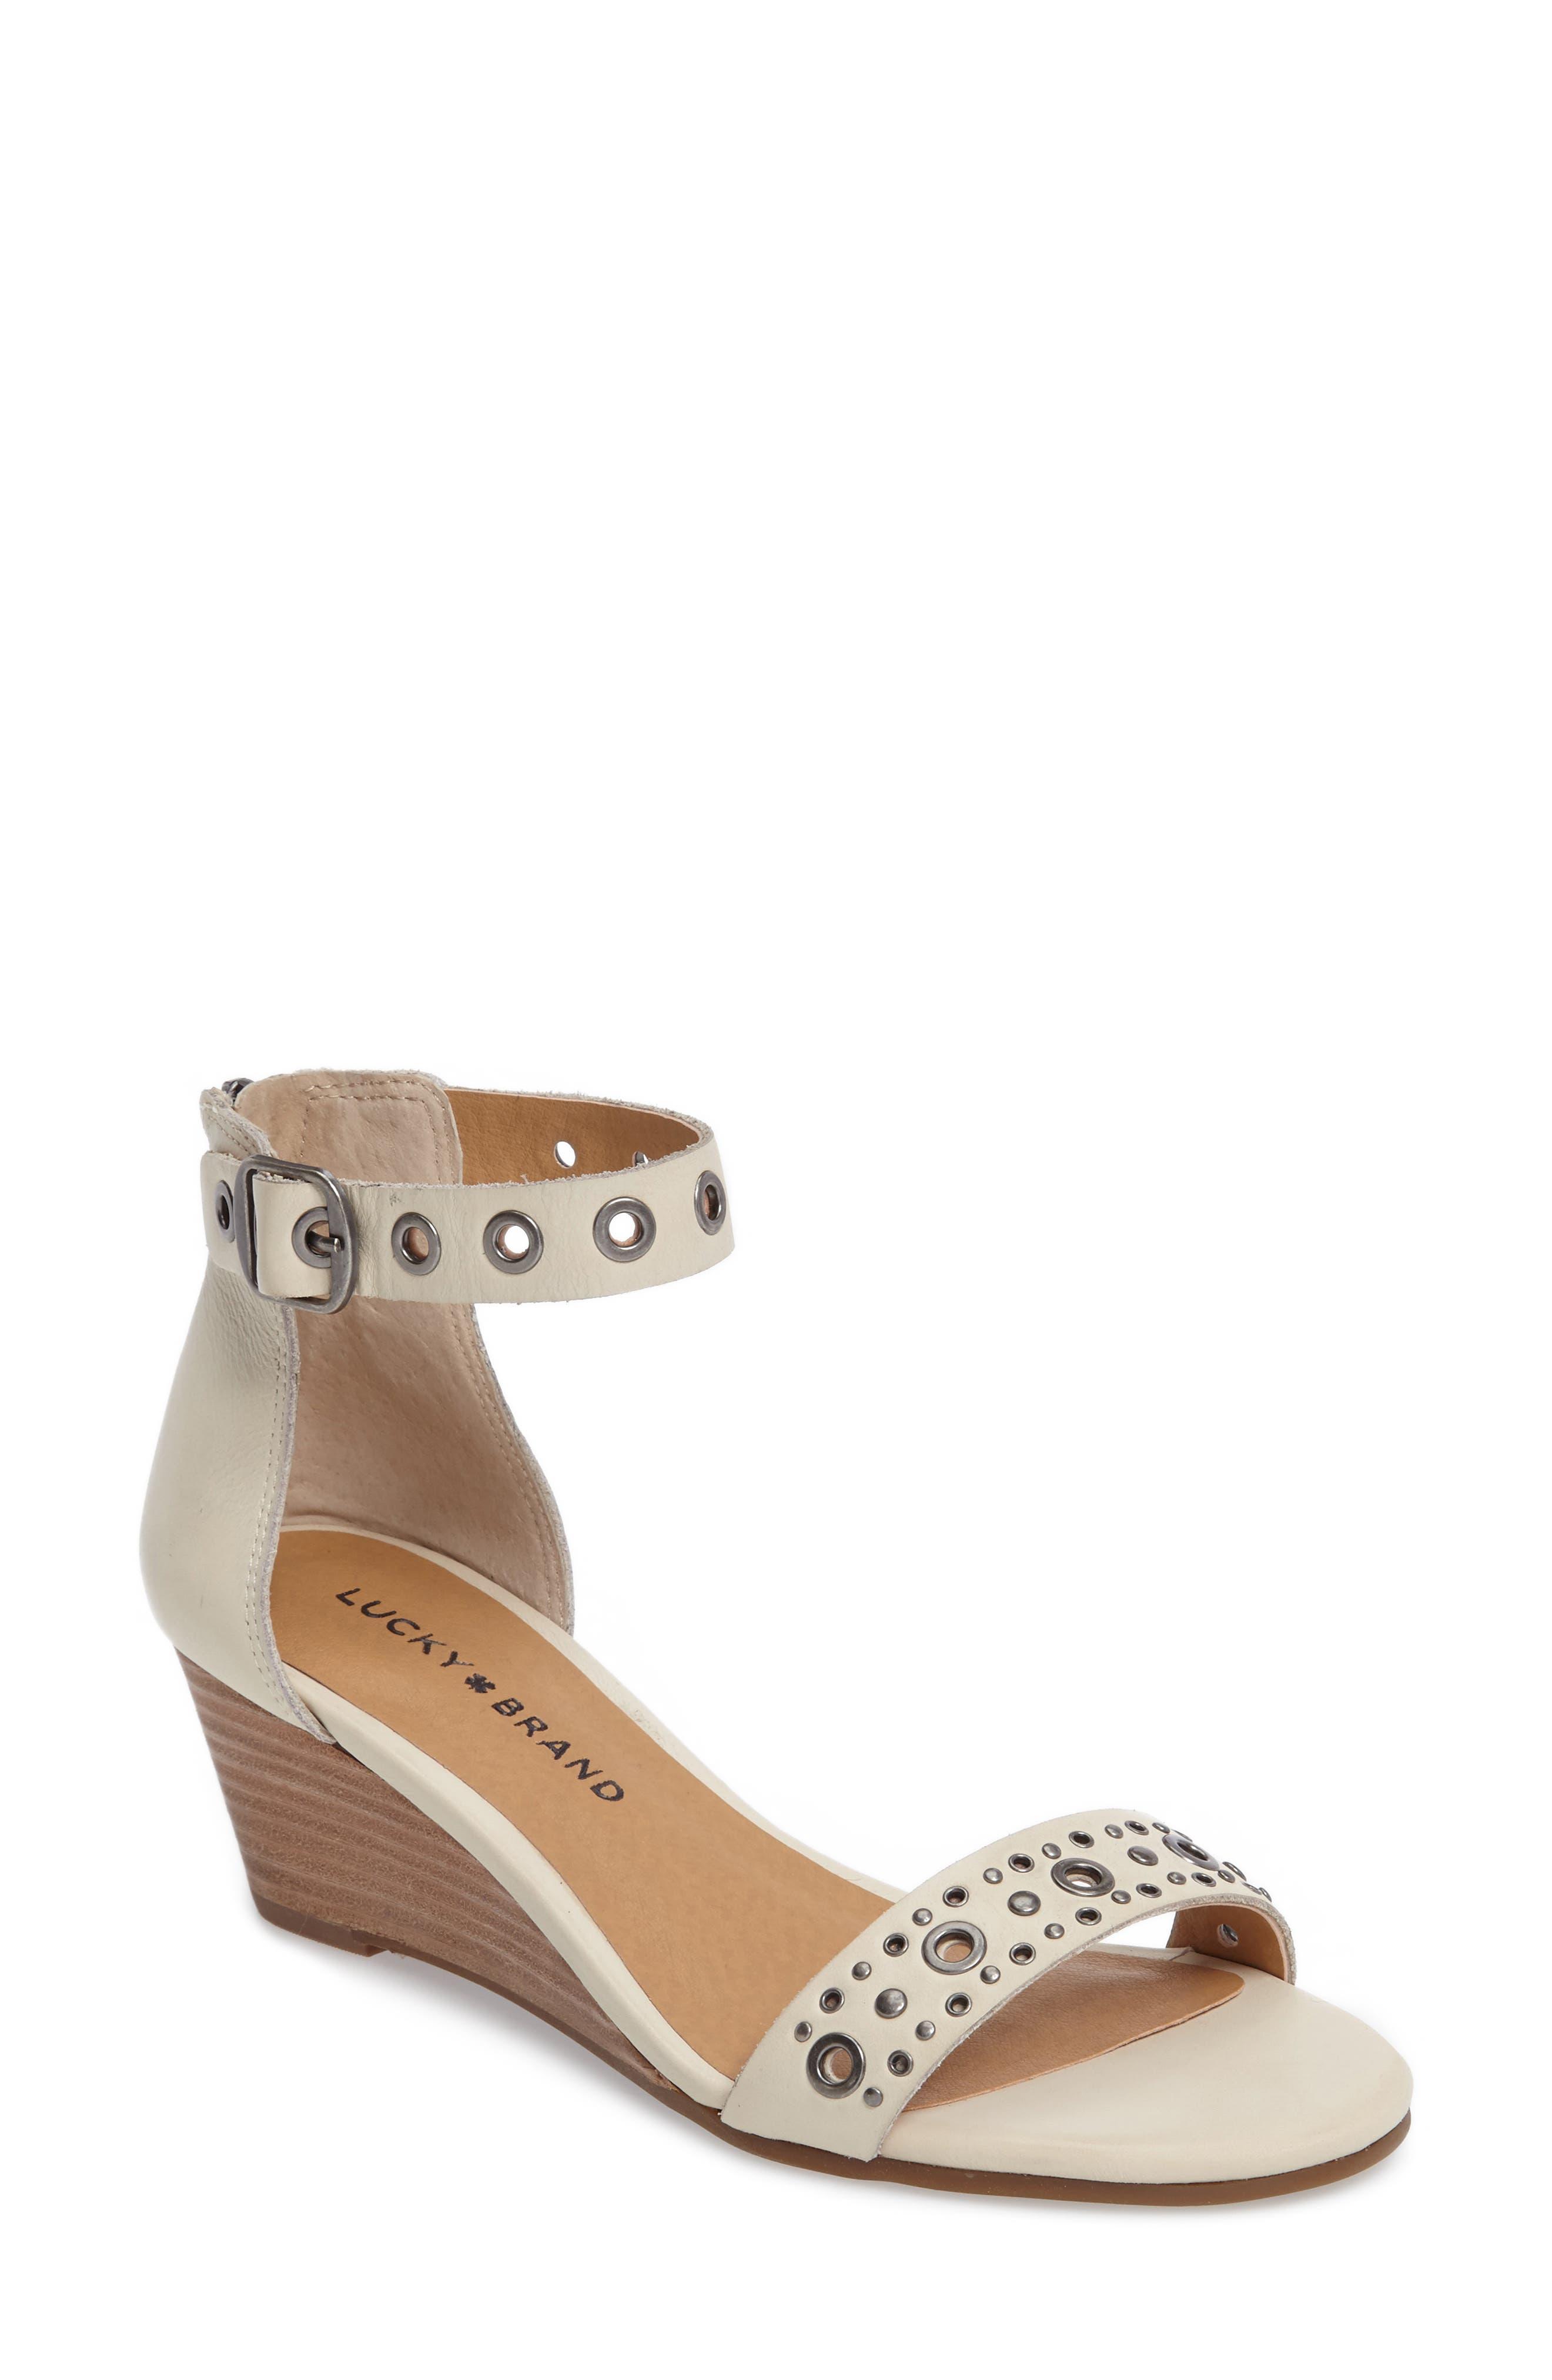 Alternate Image 1 Selected - Lucky Brand Jorey Ankle Strap Wedge Sandal (Women)